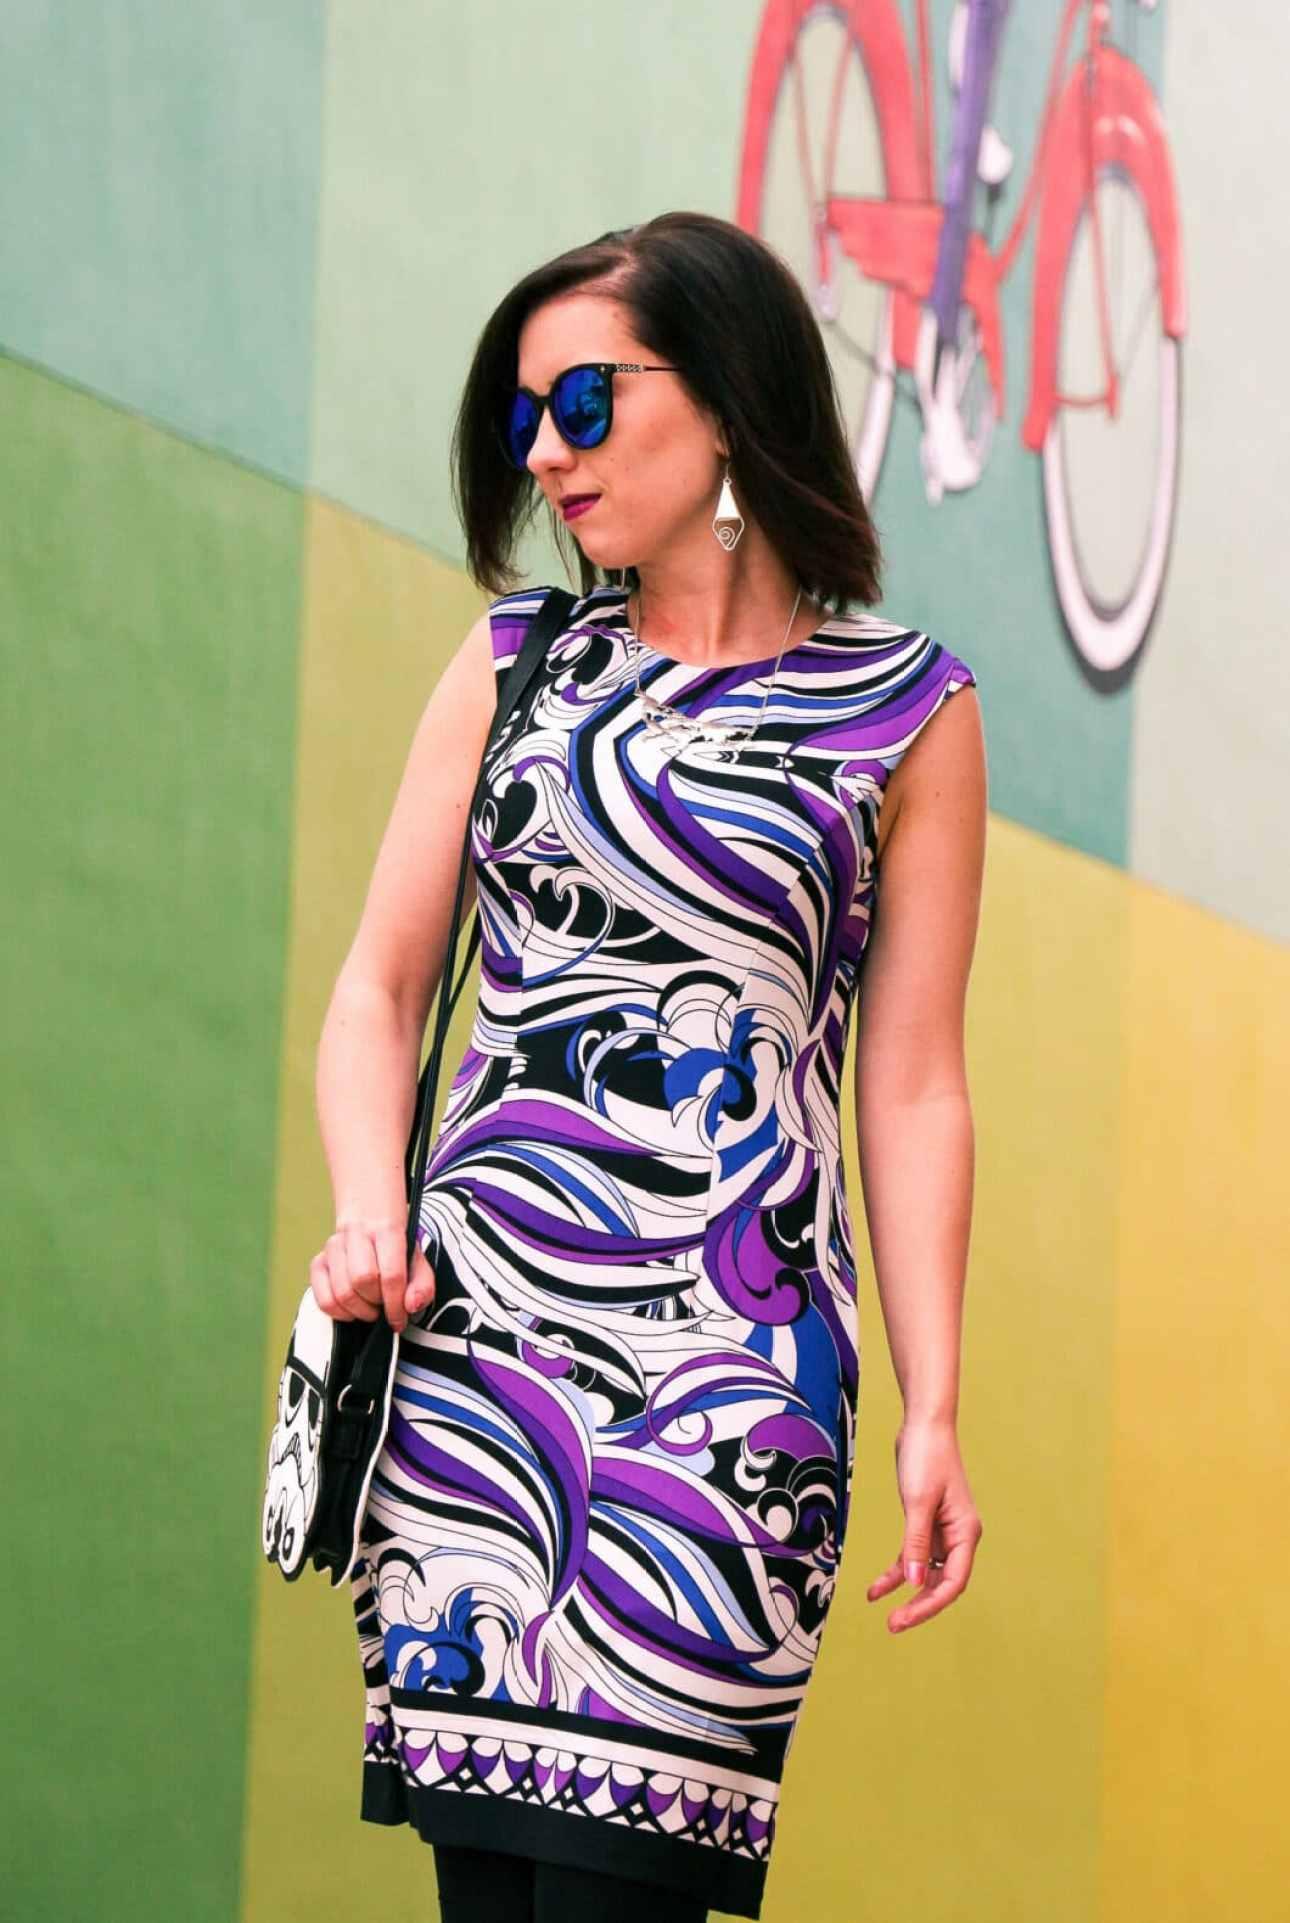 Firmoo Glasses & Lilee Fashion Dress